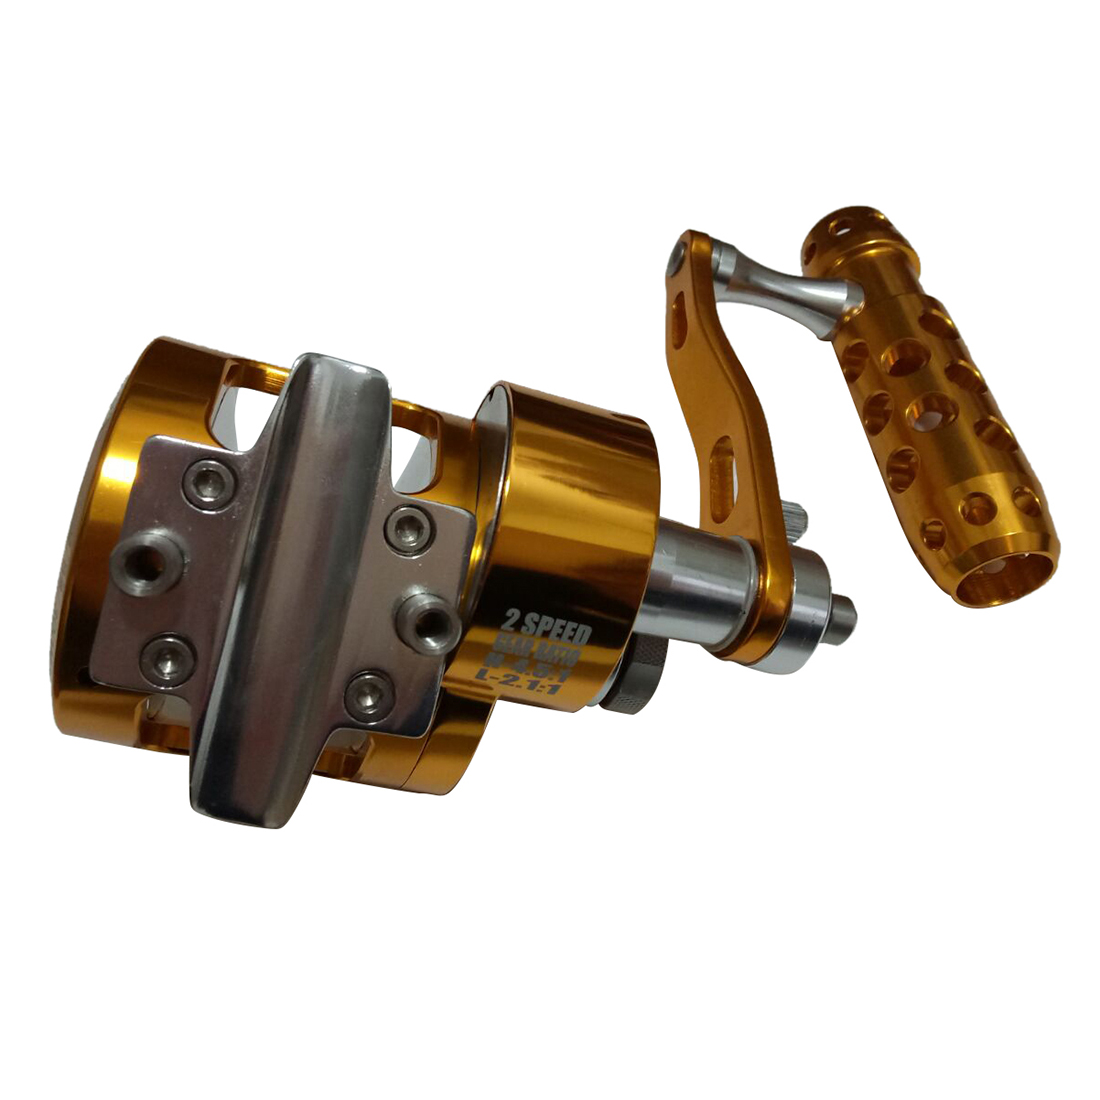 Full Metal Jigging Reel Double Speed Trolling Fishing Reel 30kgs Power Drag Deep Sea Saltwater Boat Reel SYD90 4.5:1 2.1:1 left